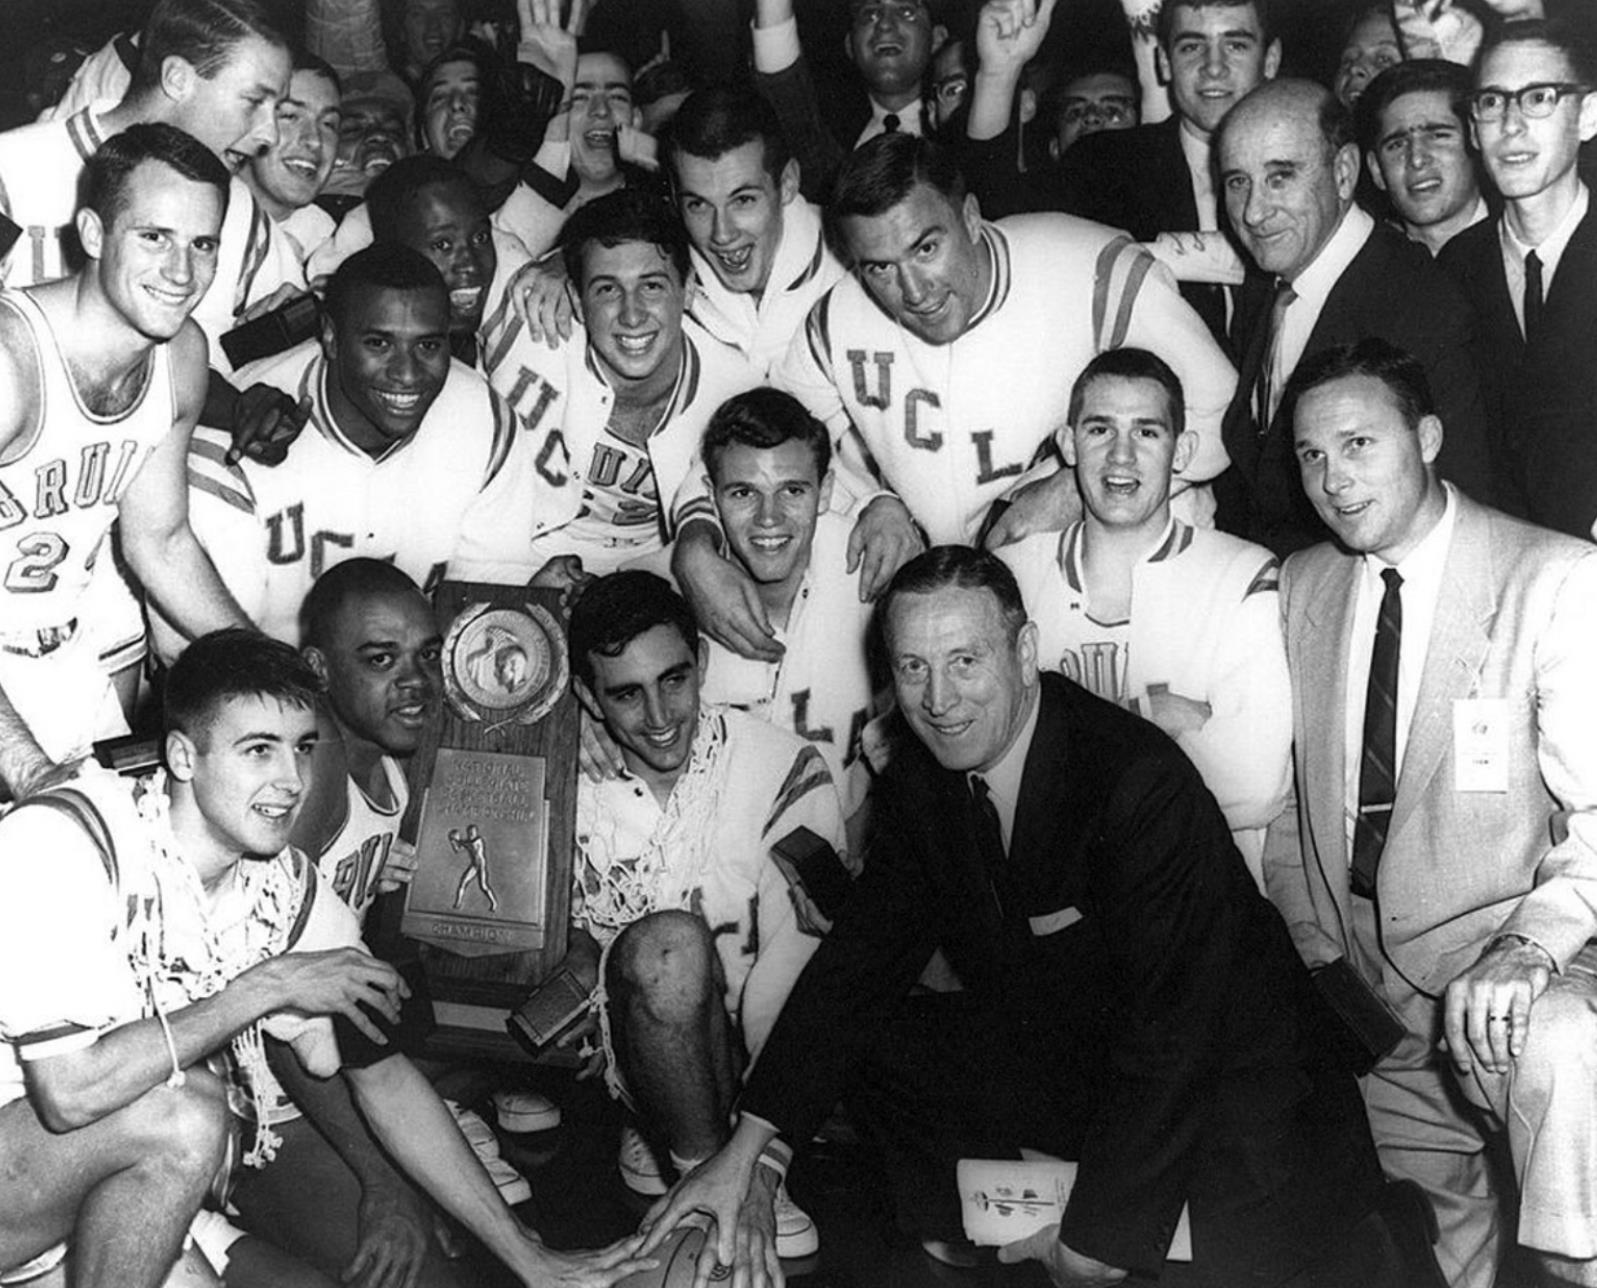 Final Fours, especially 1964, are special events | Ponca City News